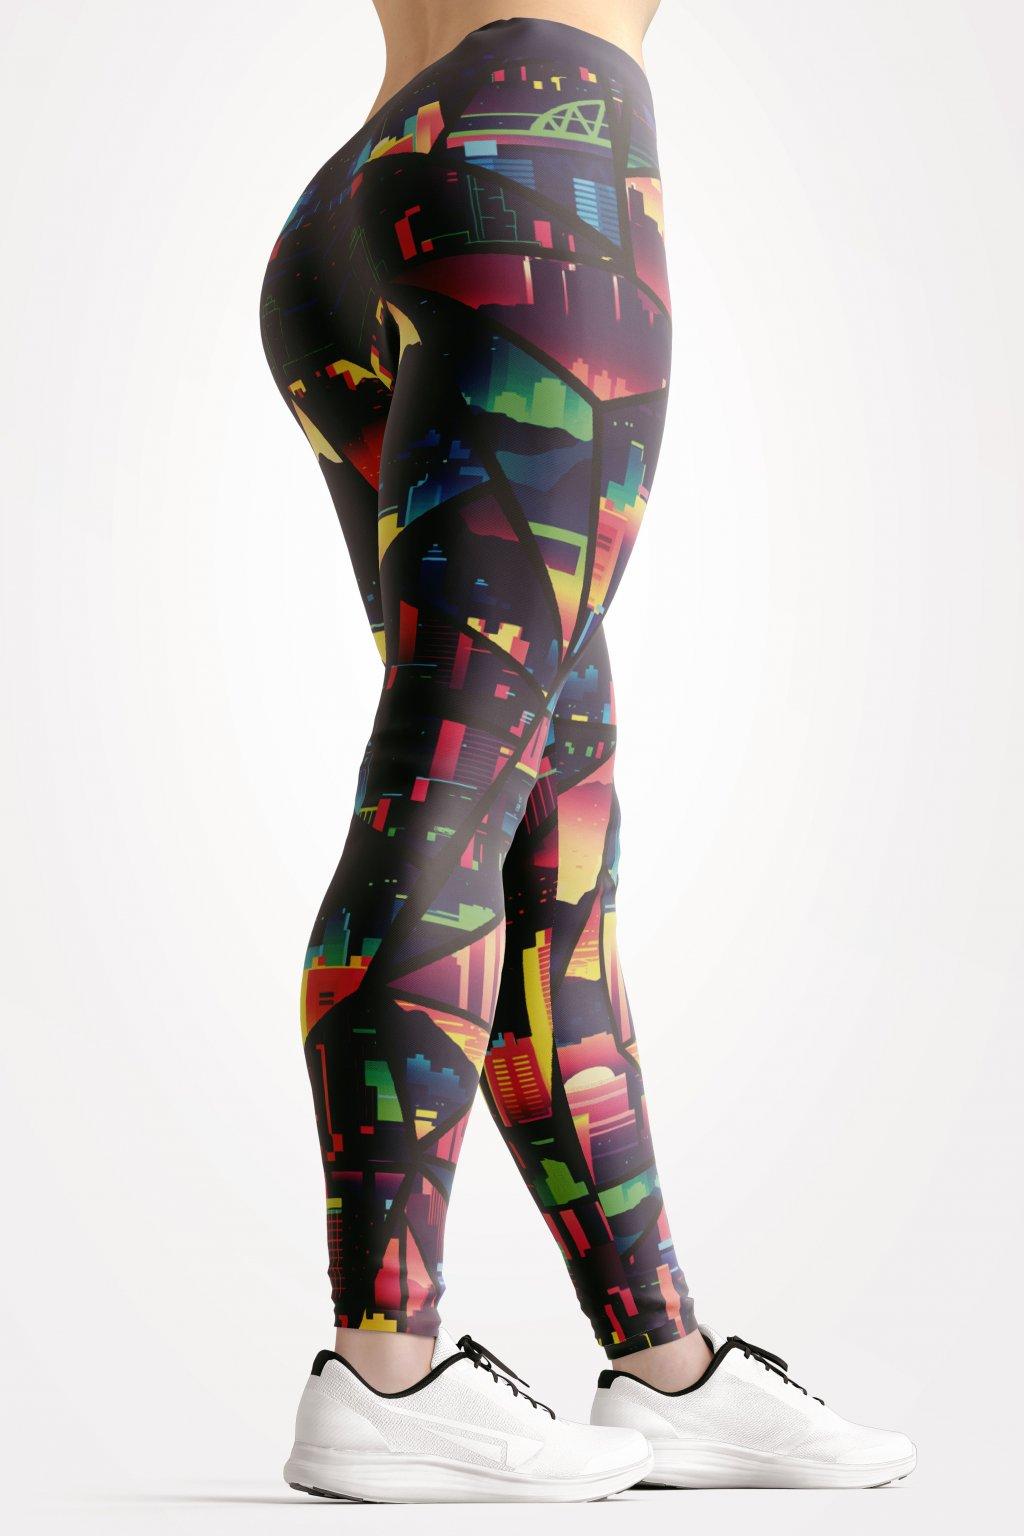 citiy of dawn leggings back by utopy